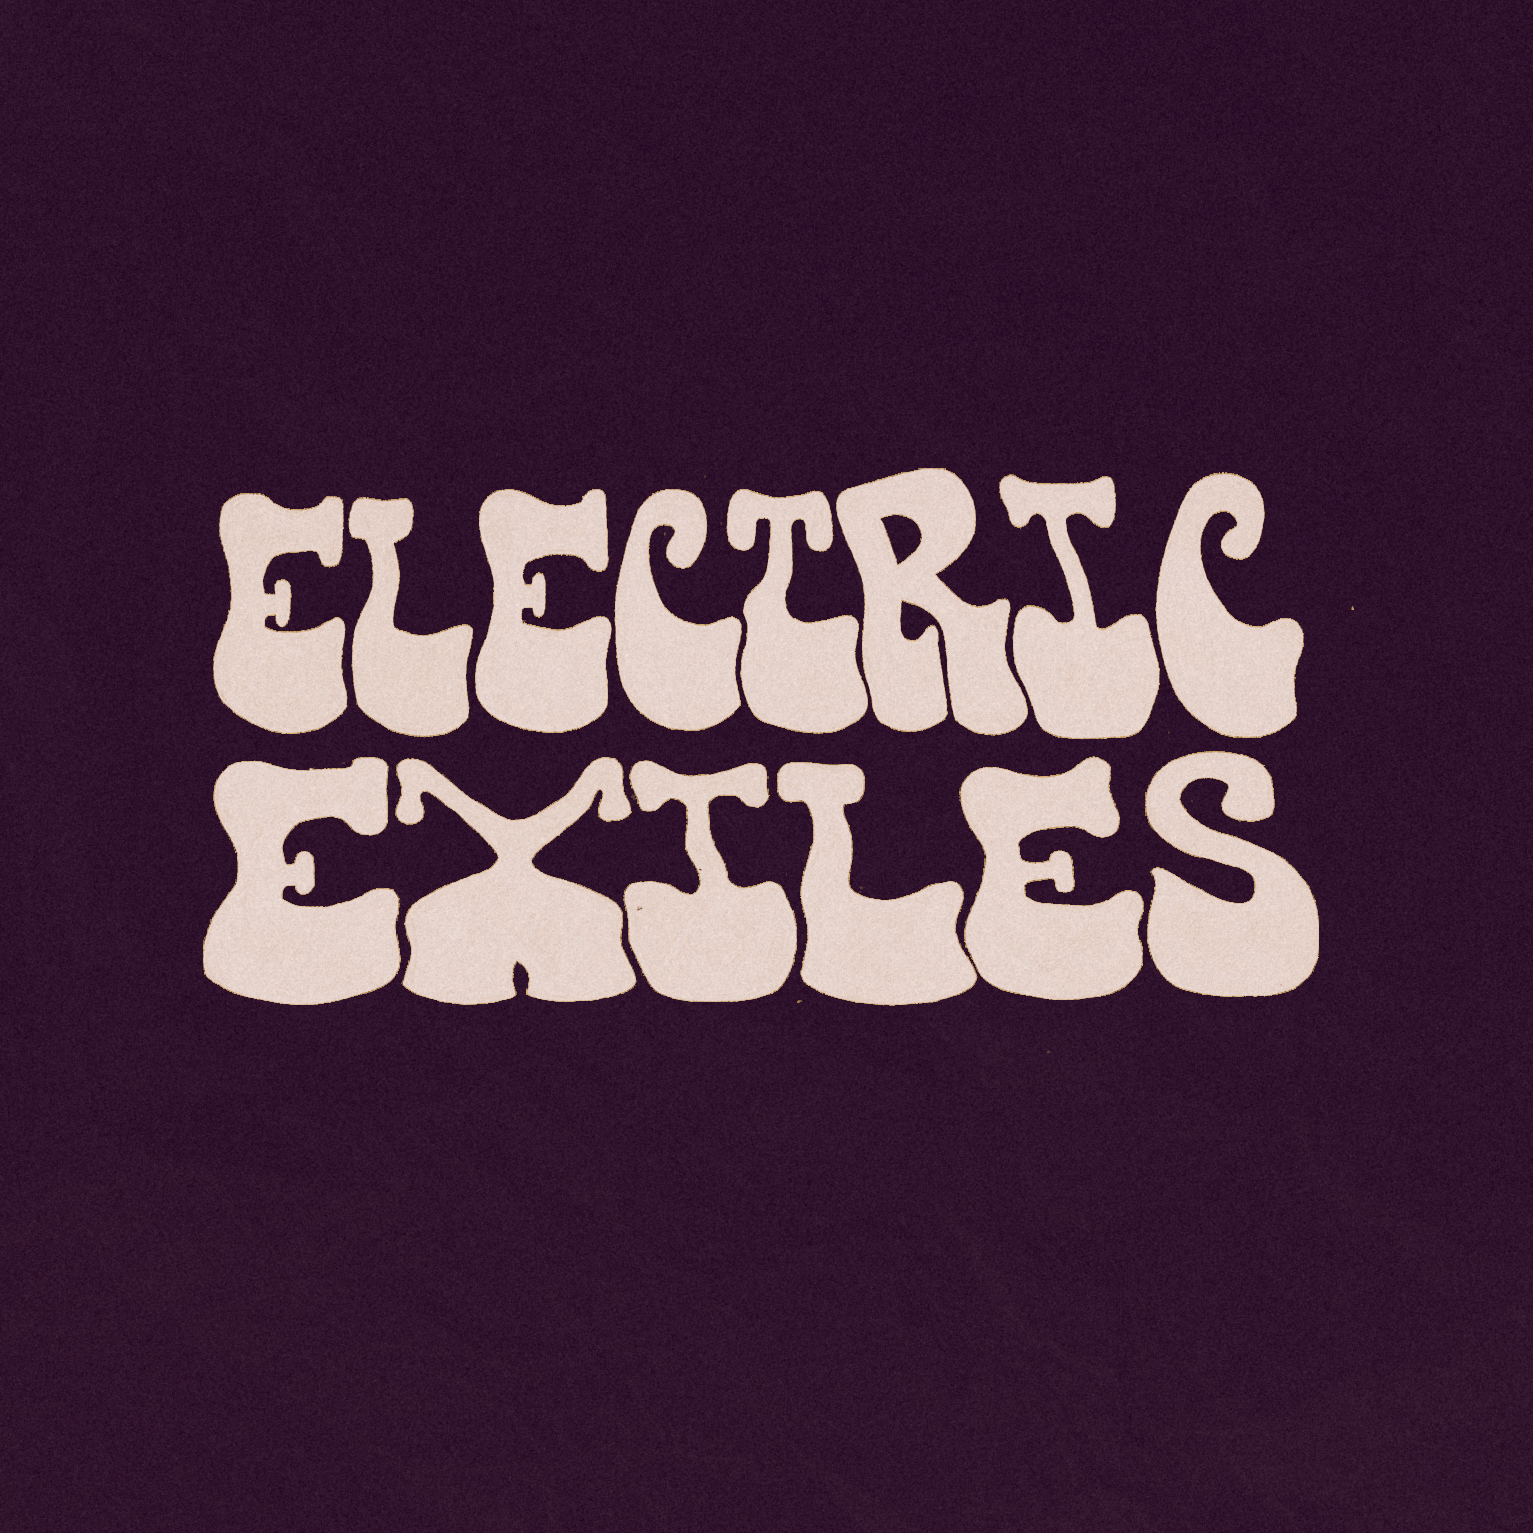 Electric Exiles